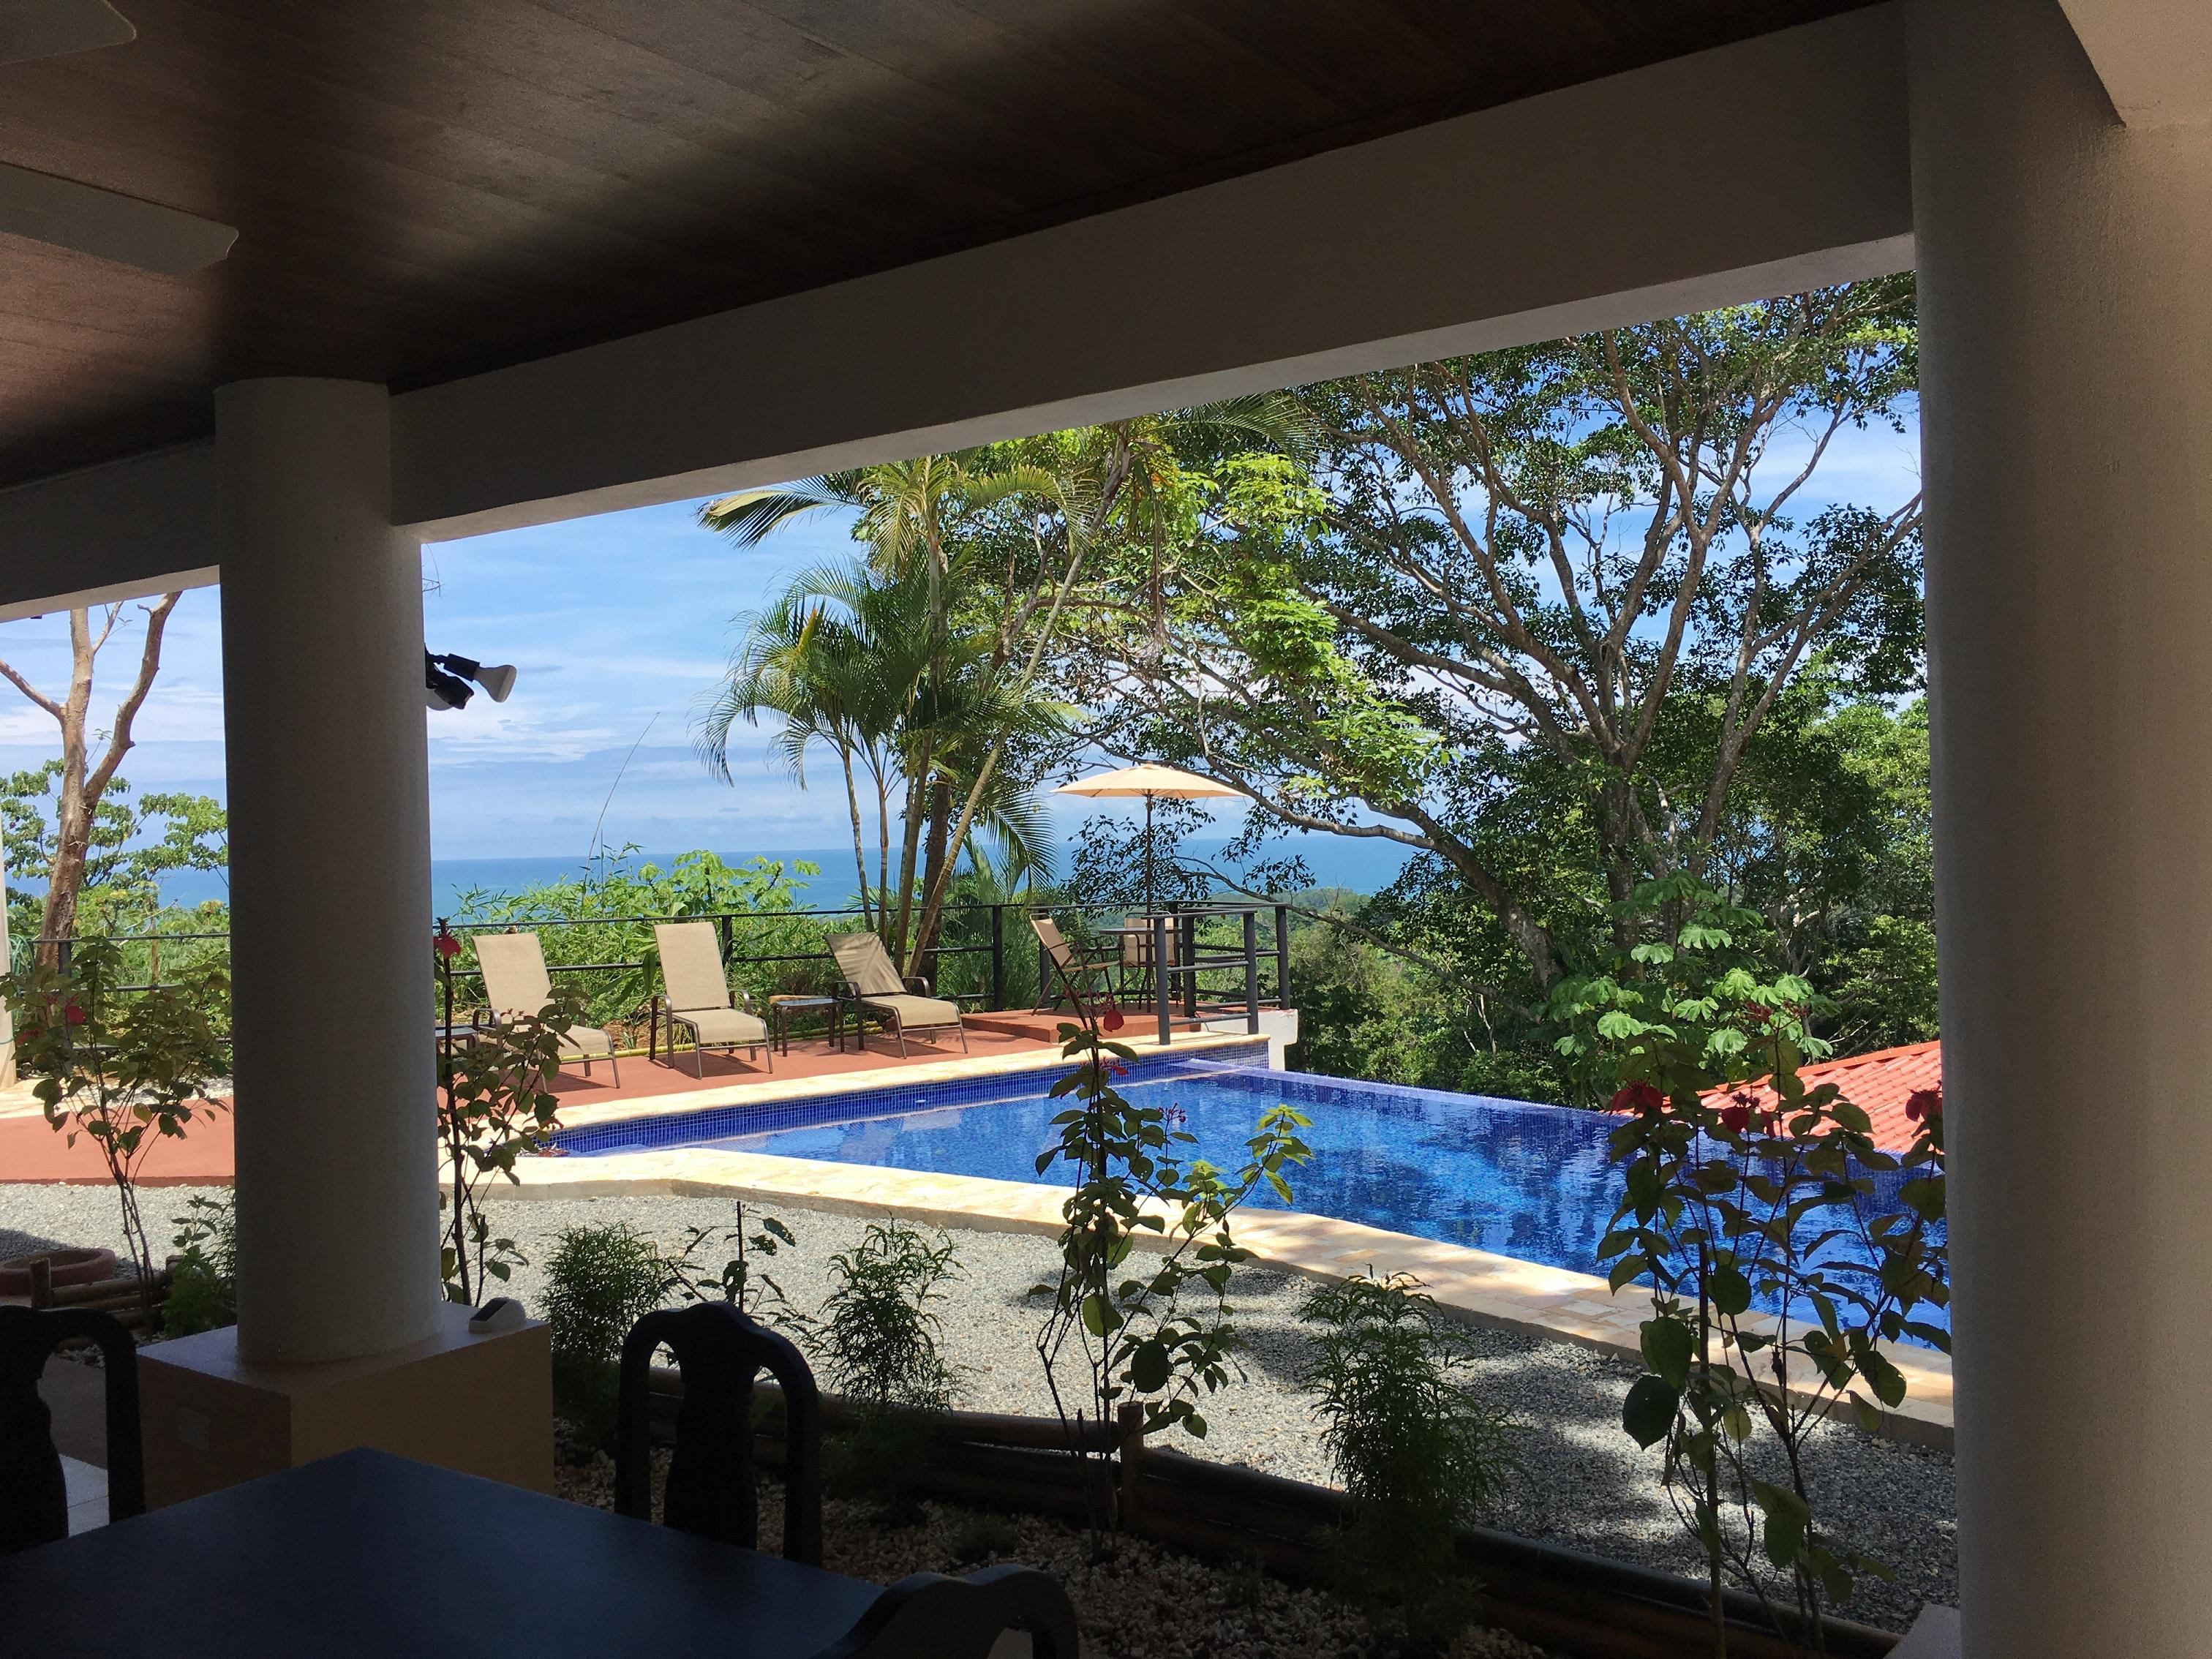 Hatillo-Costa-Rica-property-costaricarealestateHAT087-6.jpg